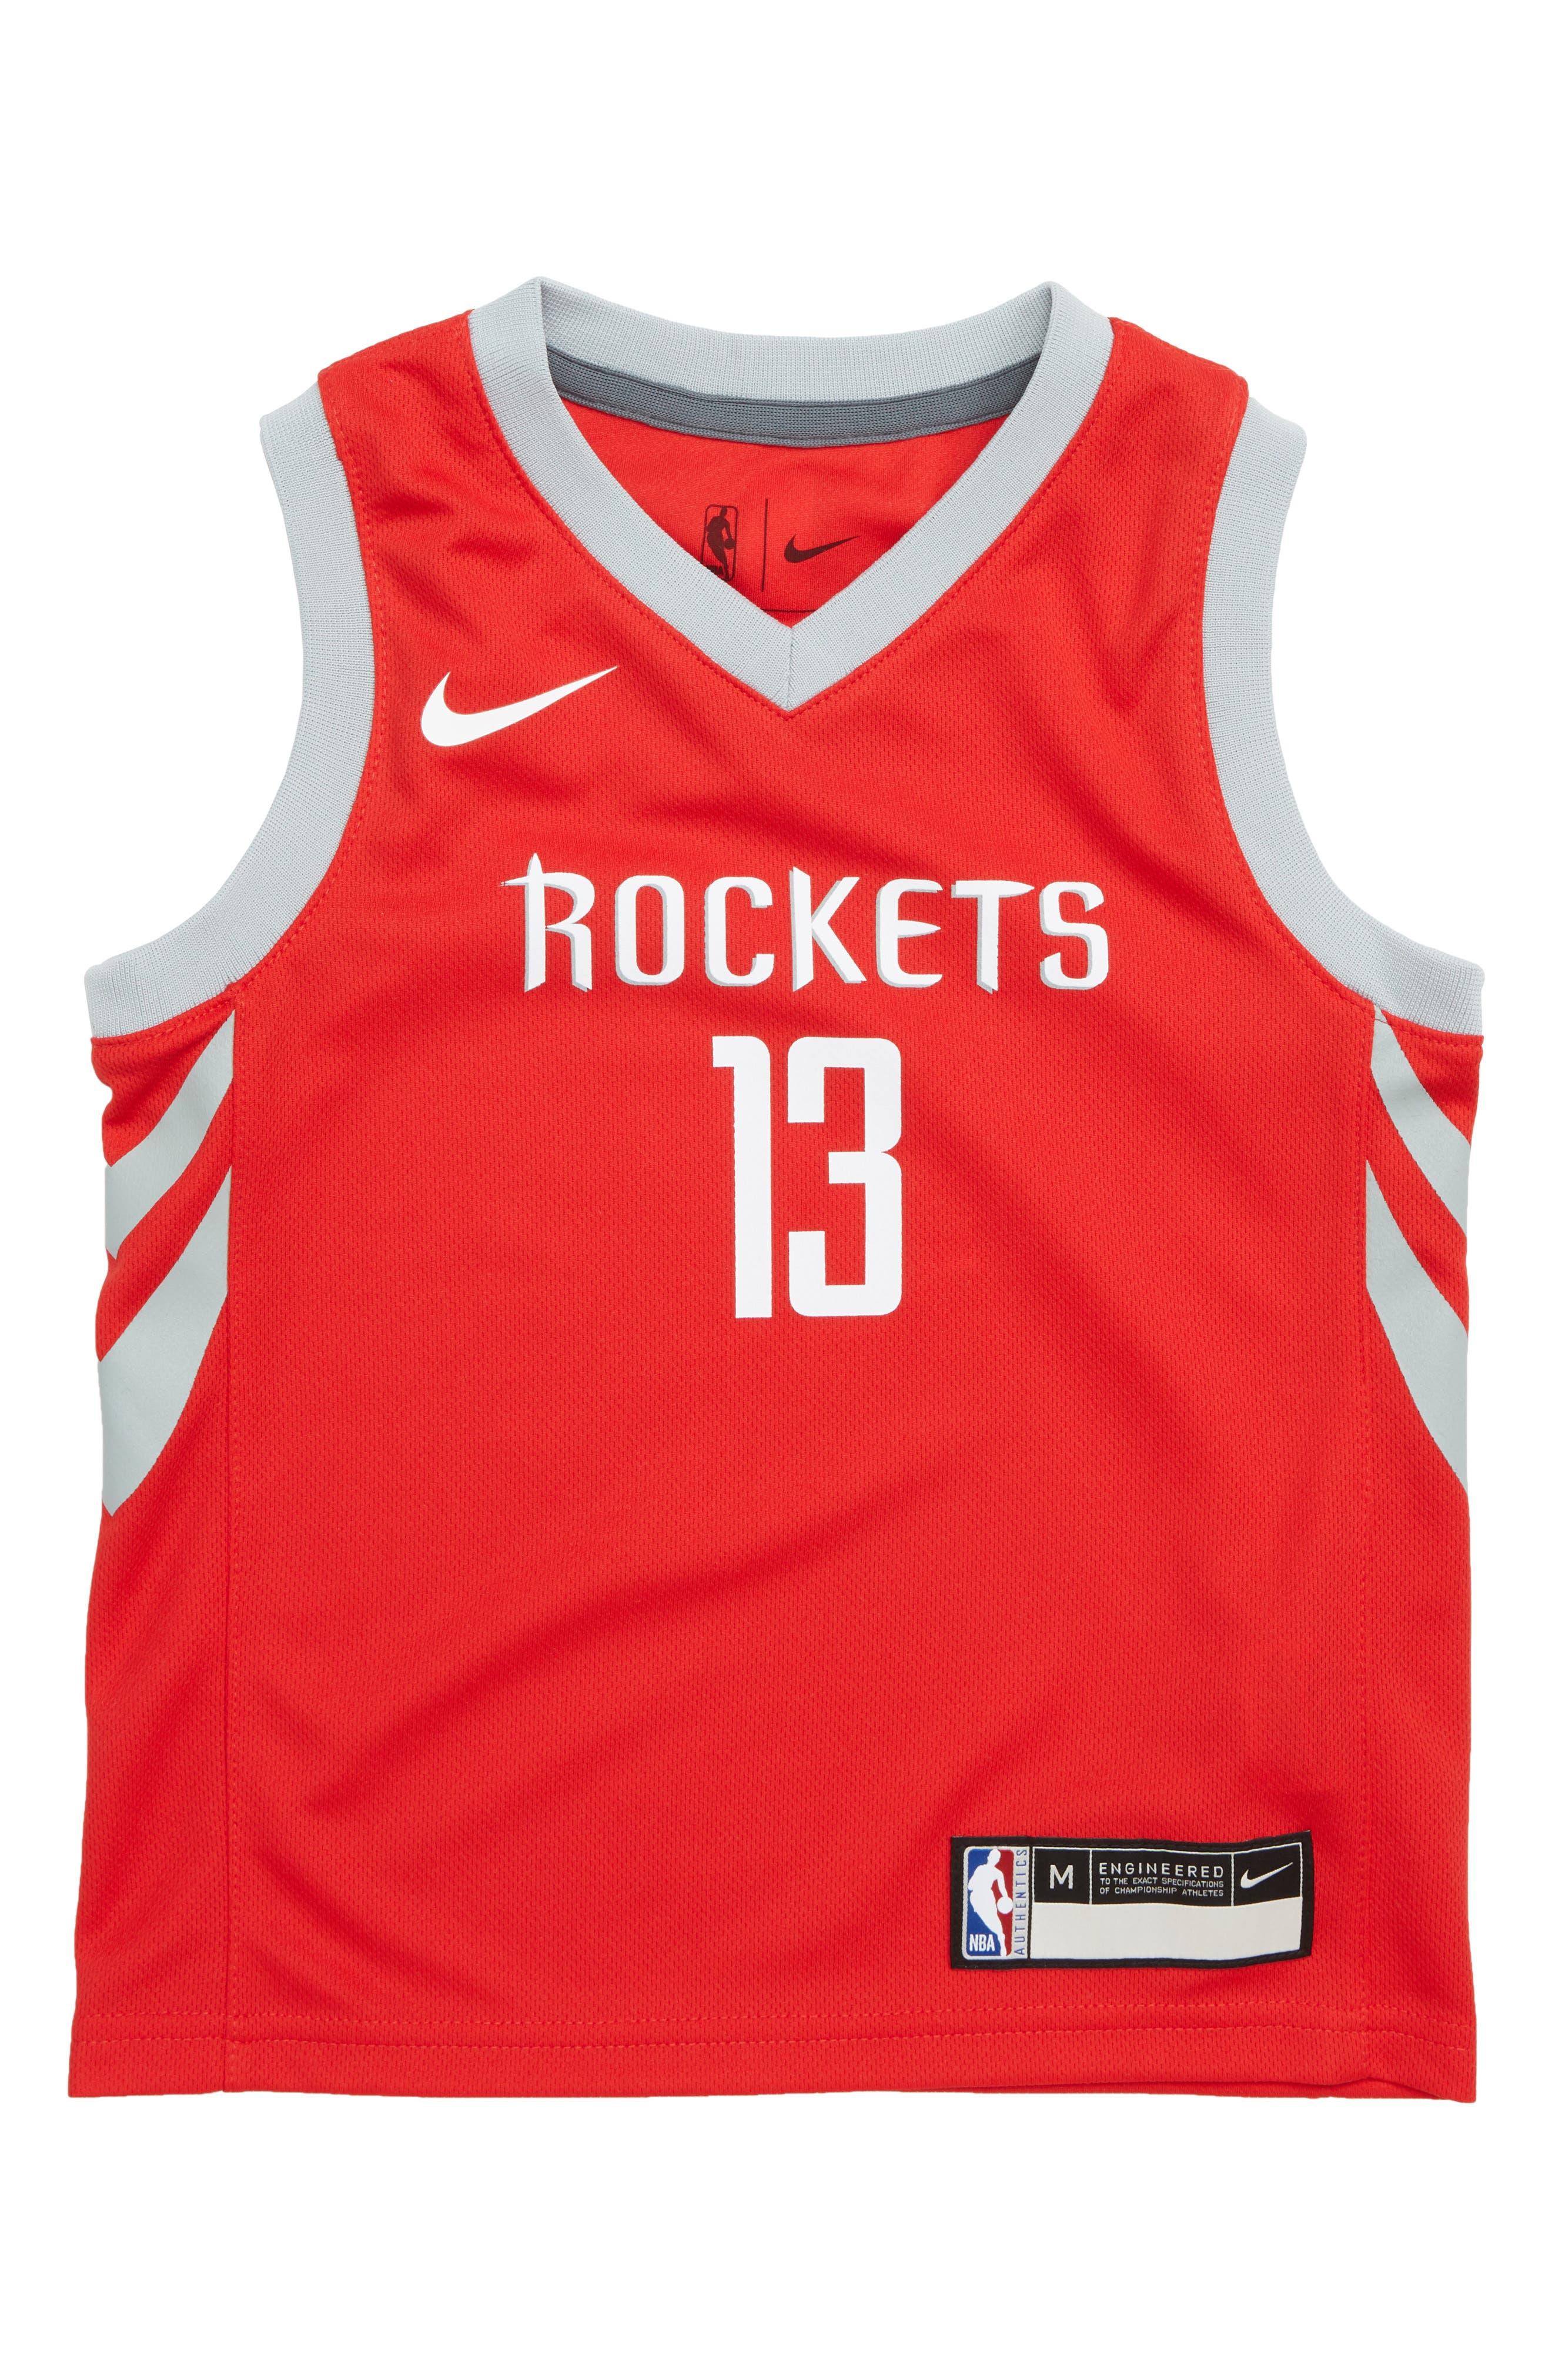 promo code f6eb4 98076 houston rockets jersey uk